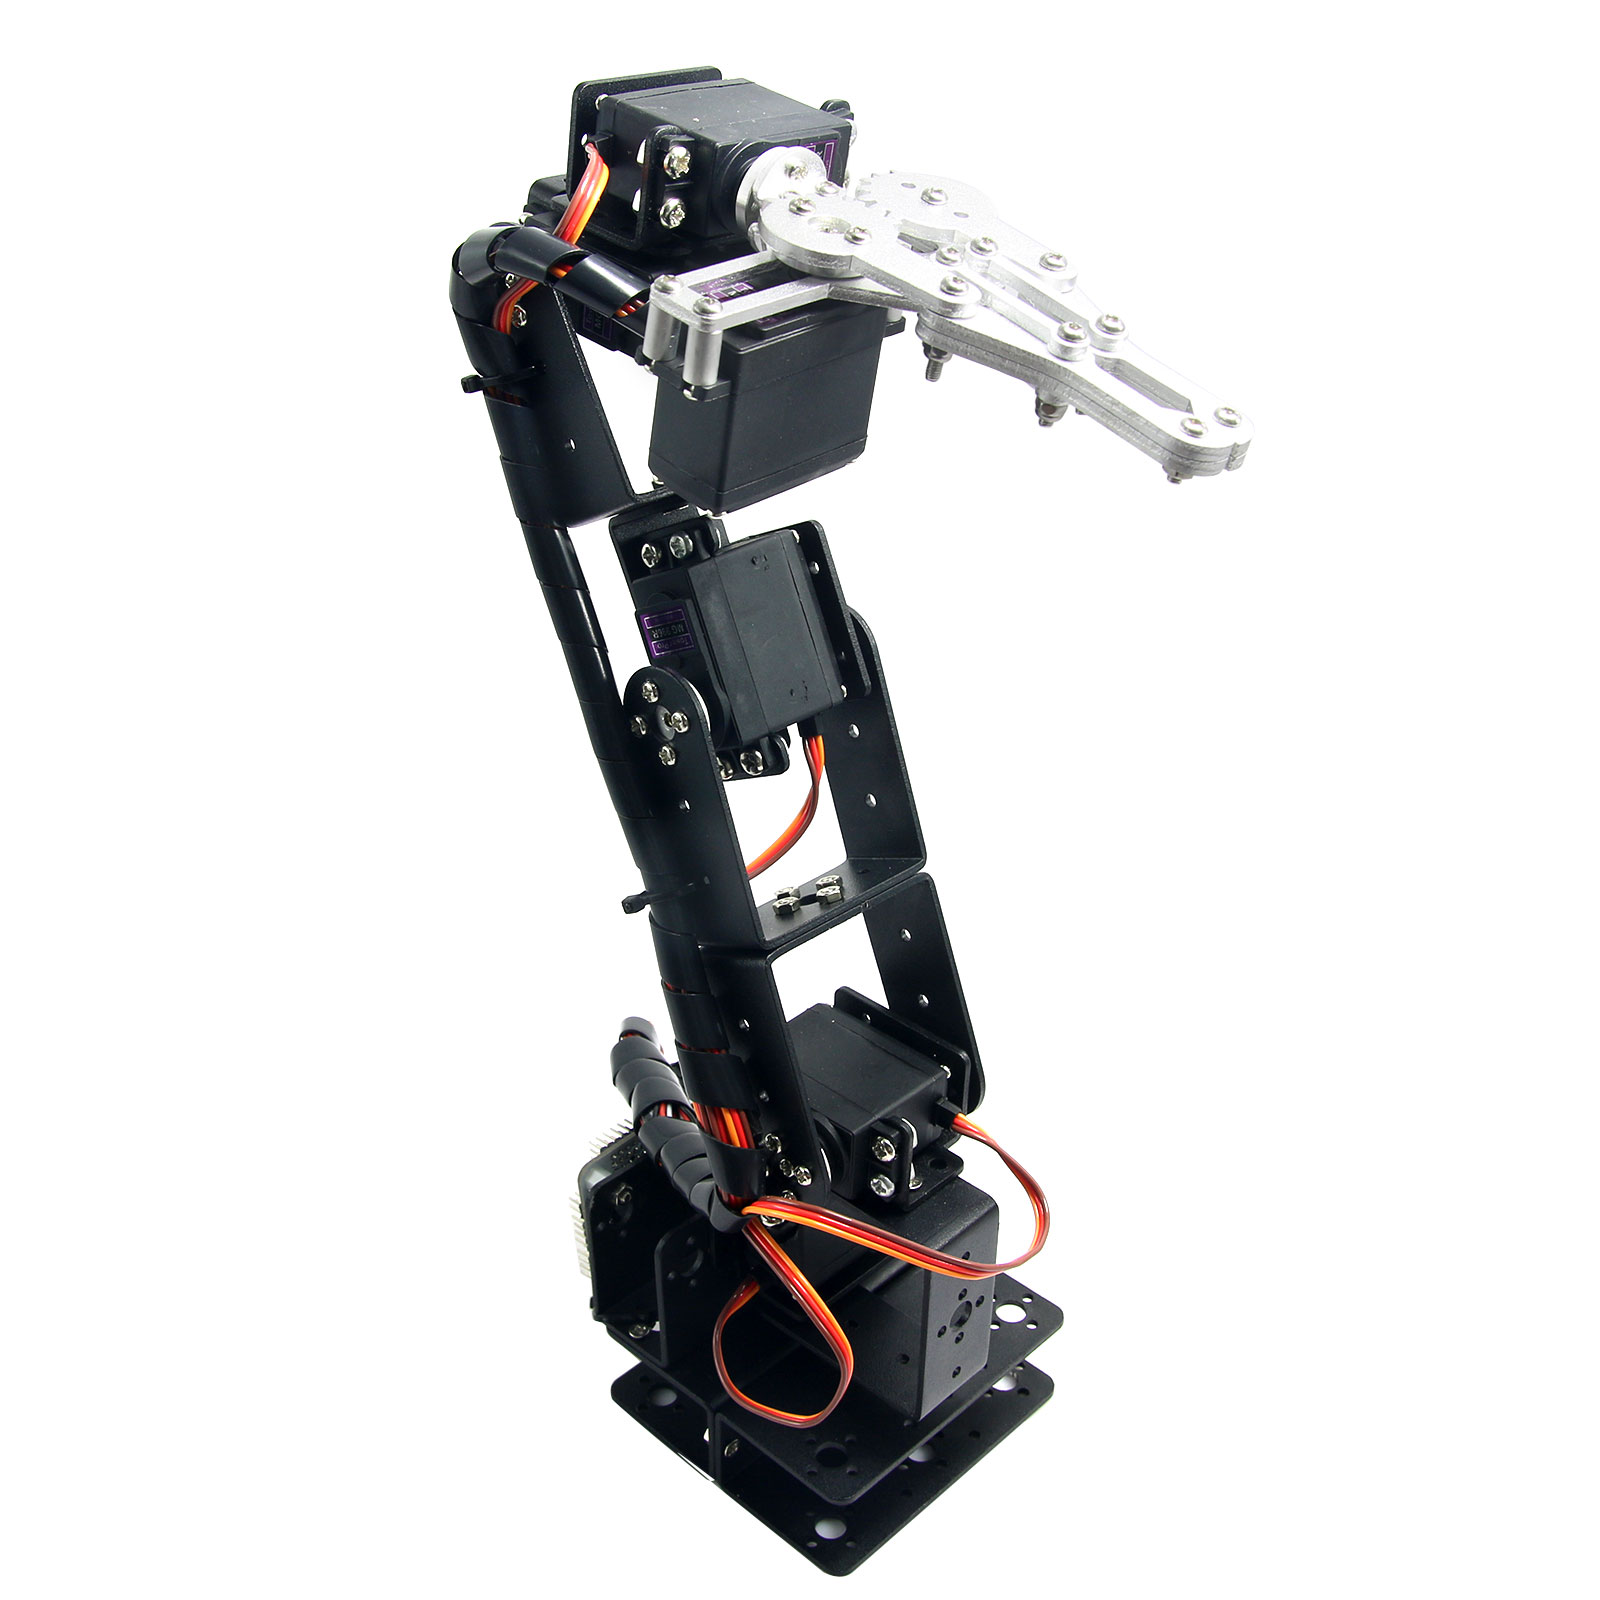 6D-3U-S Robot 6 DOF Aluminium Clamp Claw Mount kit Mechanical Robotic Arm & 6pcs MG996R Servos & Metal Servo Horn 4 dof wood robotic arm sg90 servo for arduino raspberry pie snam1500